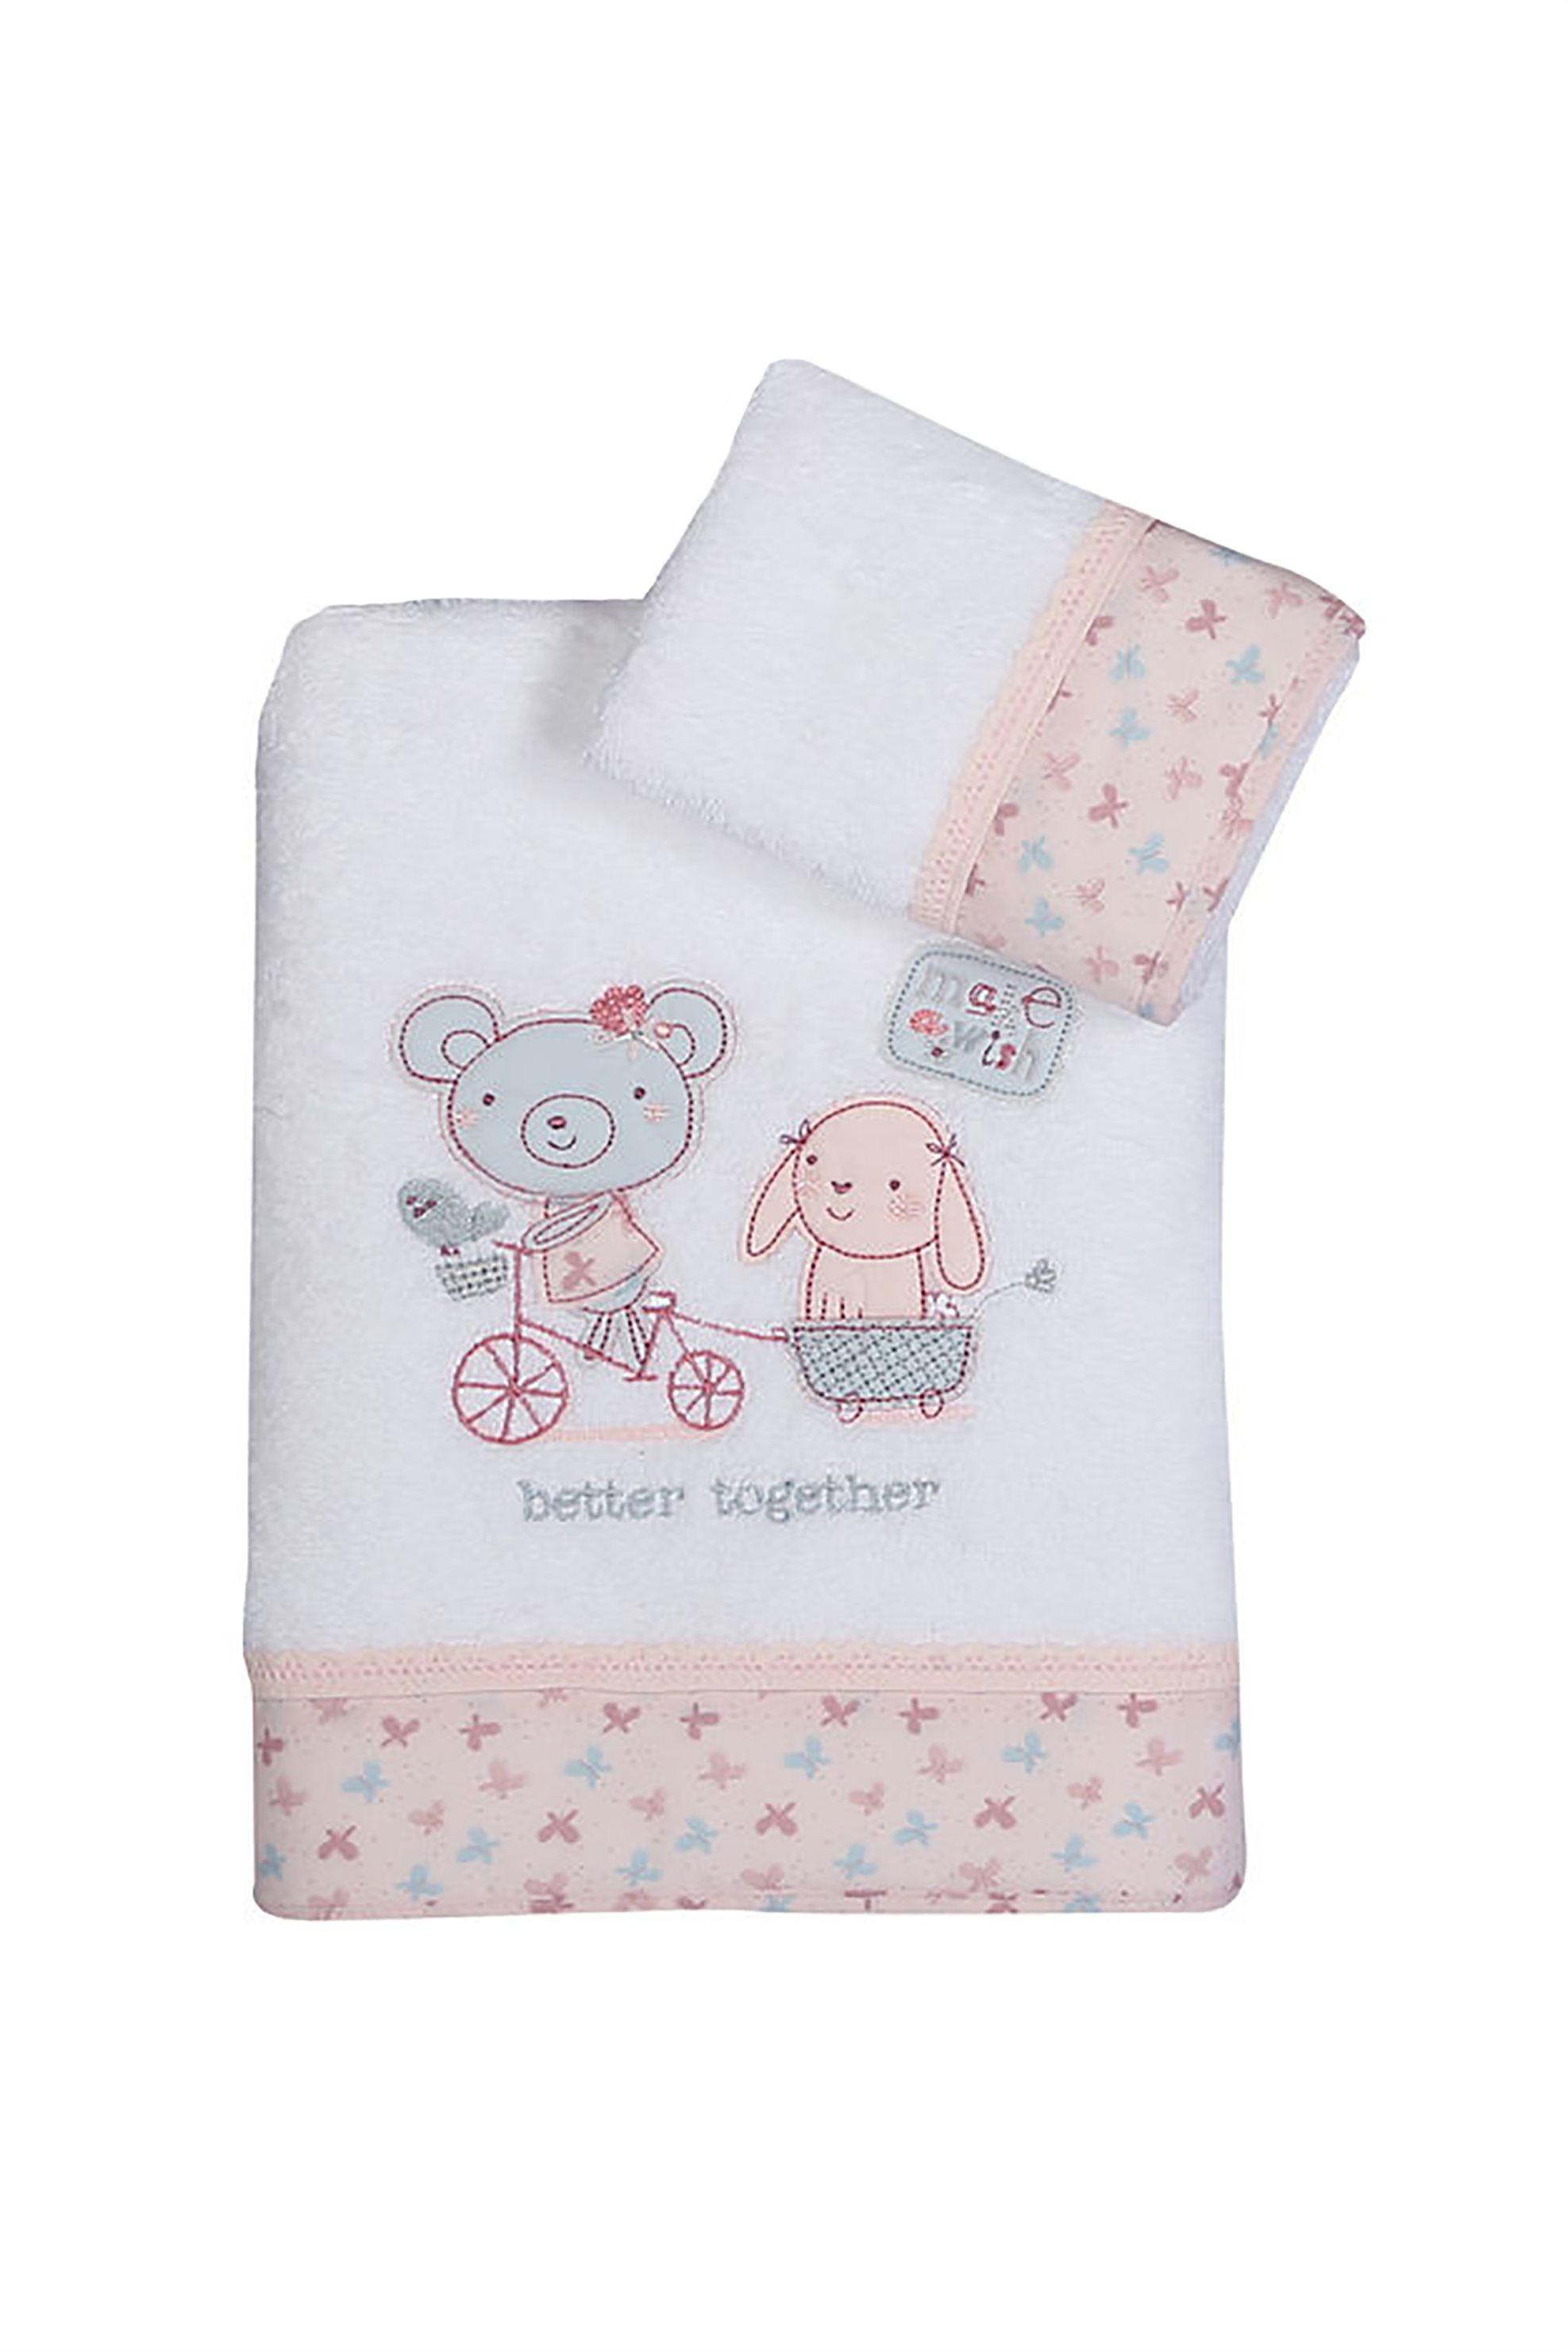 NEF-NEF Σετ βρεφικές πετσέτες Better Together (2 τεμάχια)  - 021475 - Λευκό home   παιδια   πετσέτες   σετ παιδικές πετσέτες